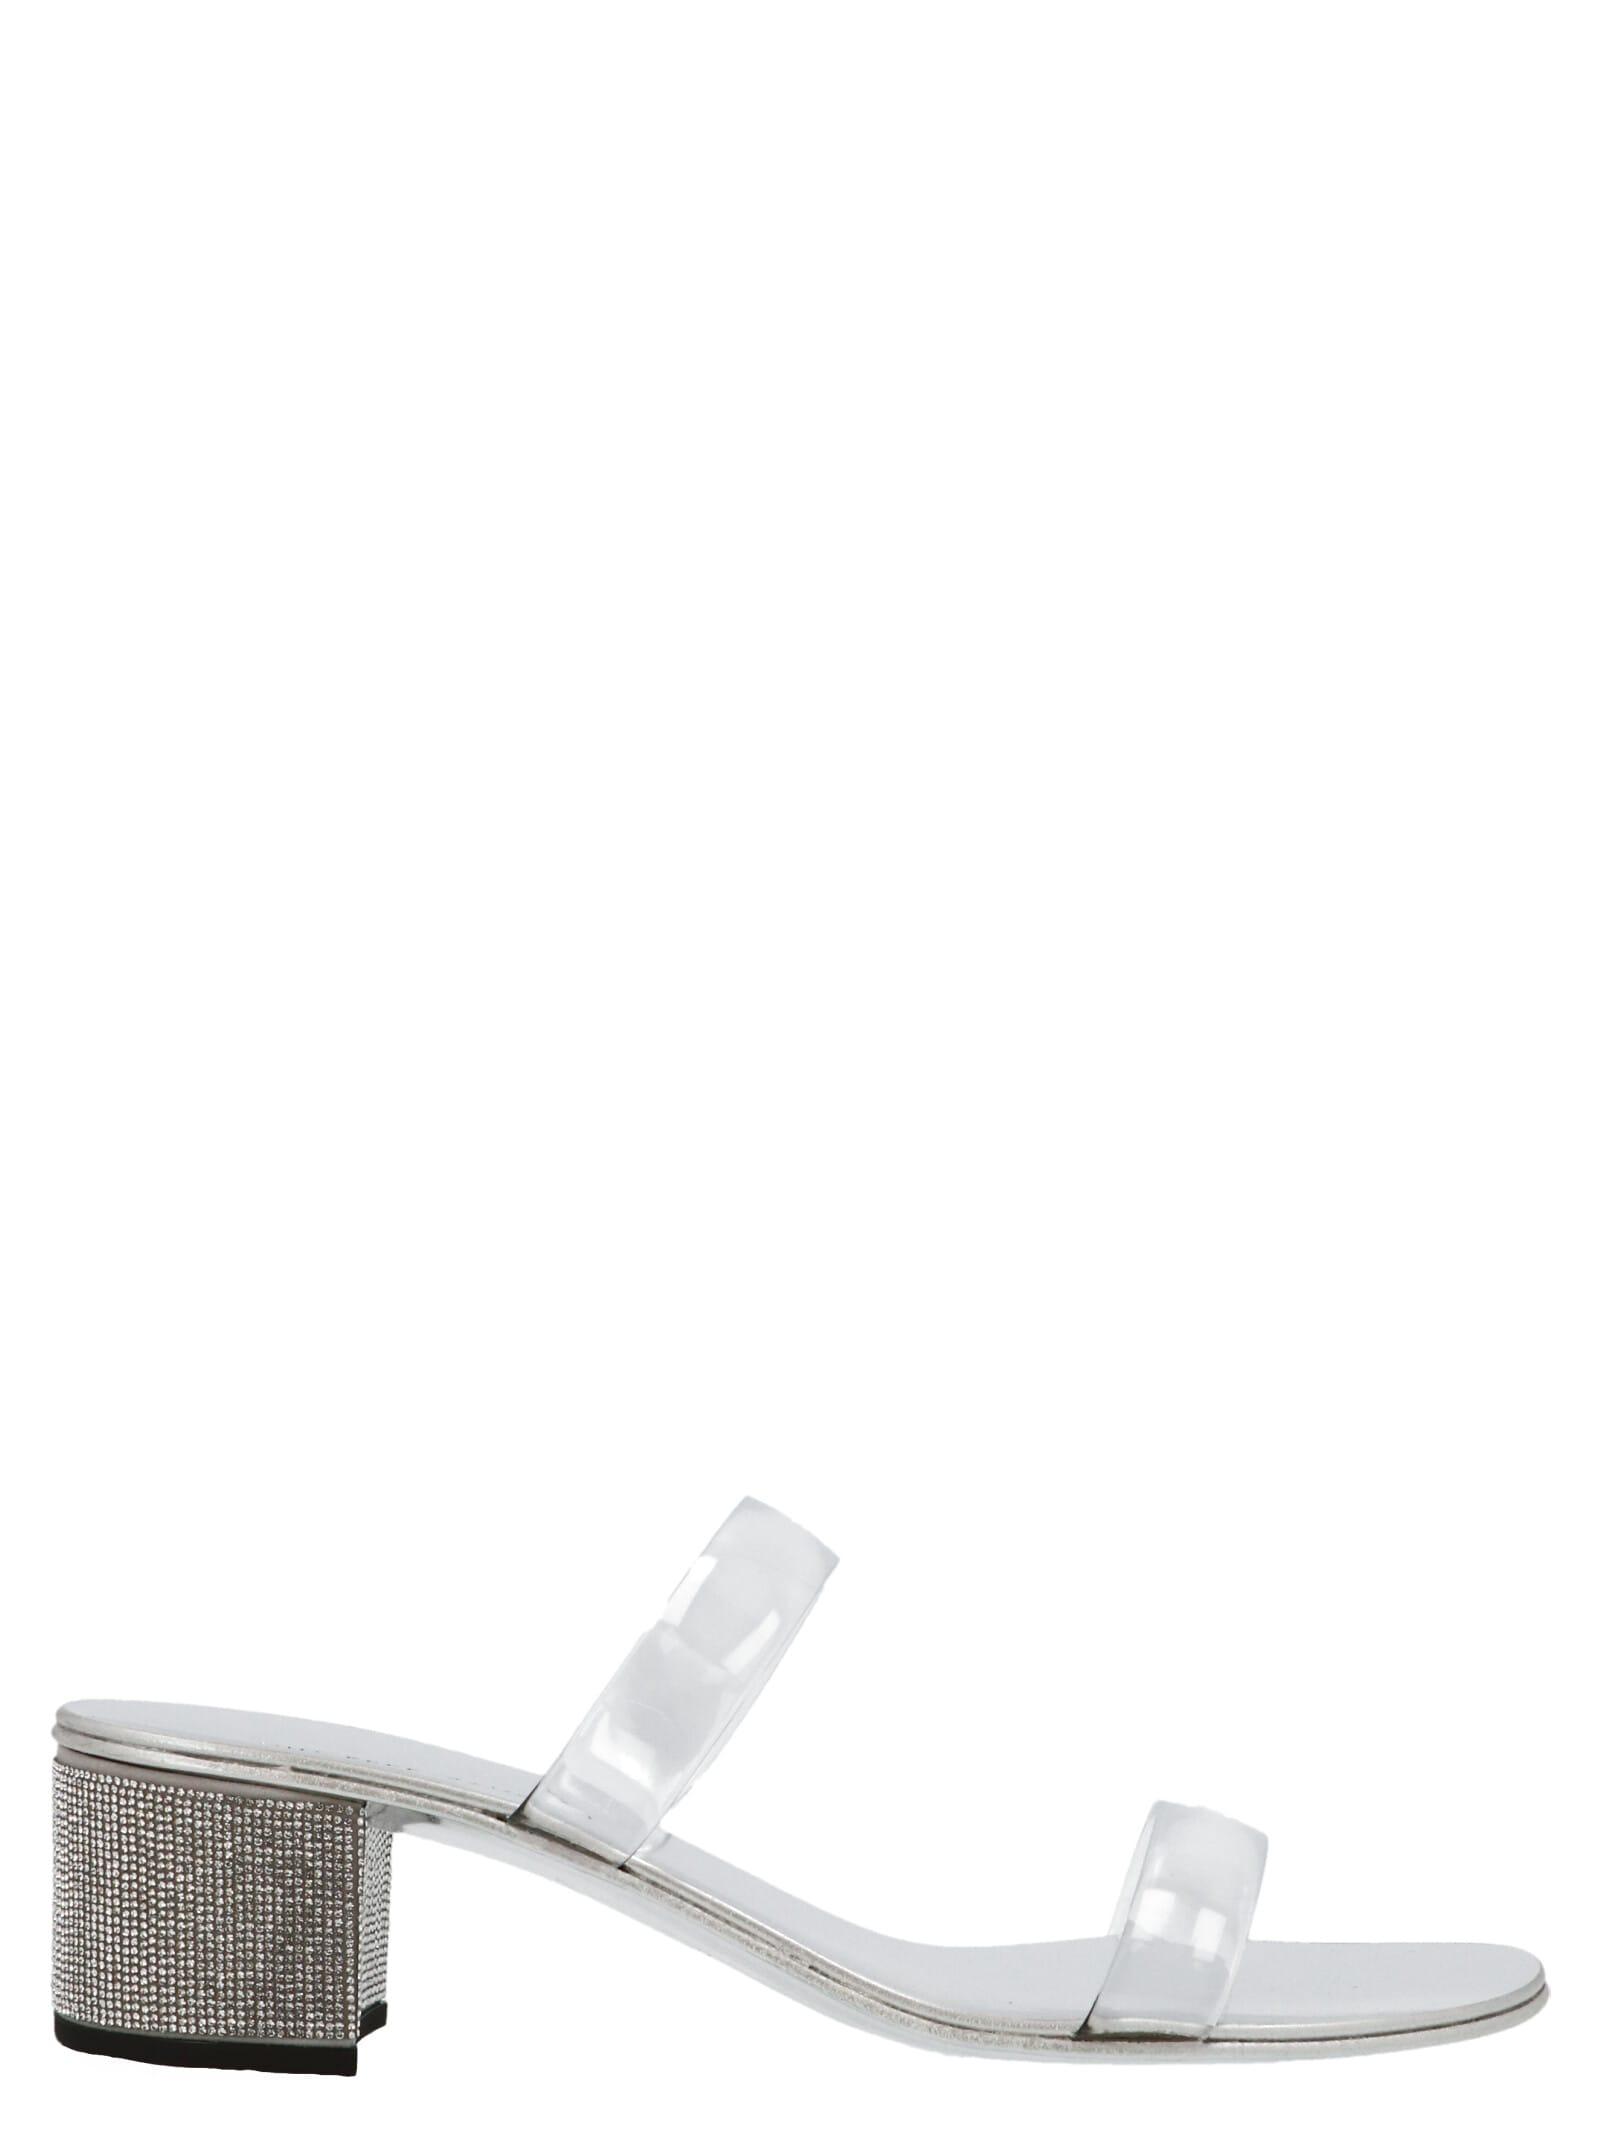 Giuseppe Zanotti Aurelia 40 Shoes In Silver